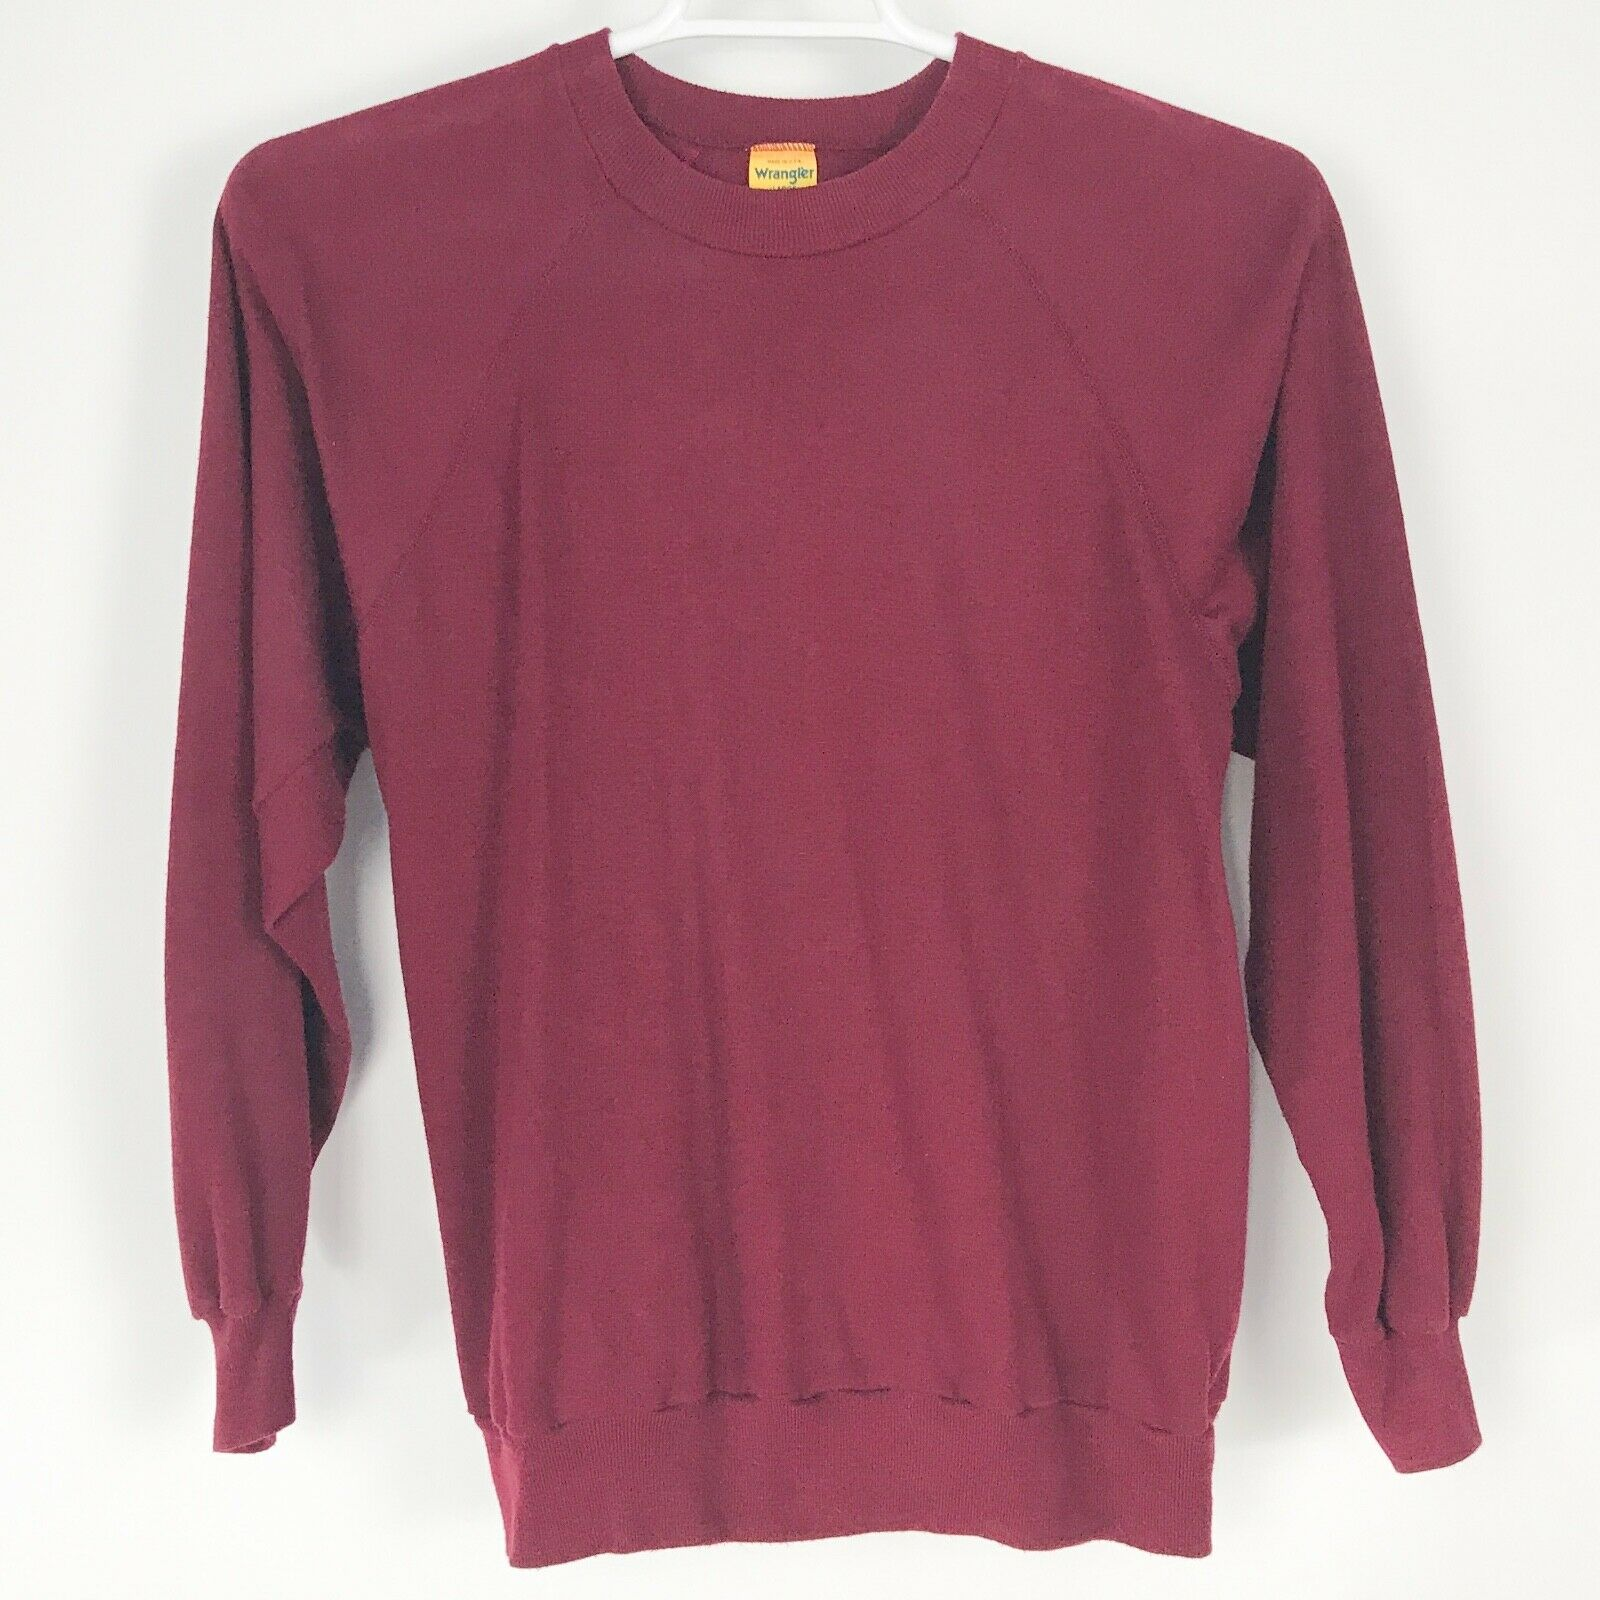 WRANGLER VINTAGE SWEATSHIRT Woherren Casual Made USA Top Sweater Größe Large L